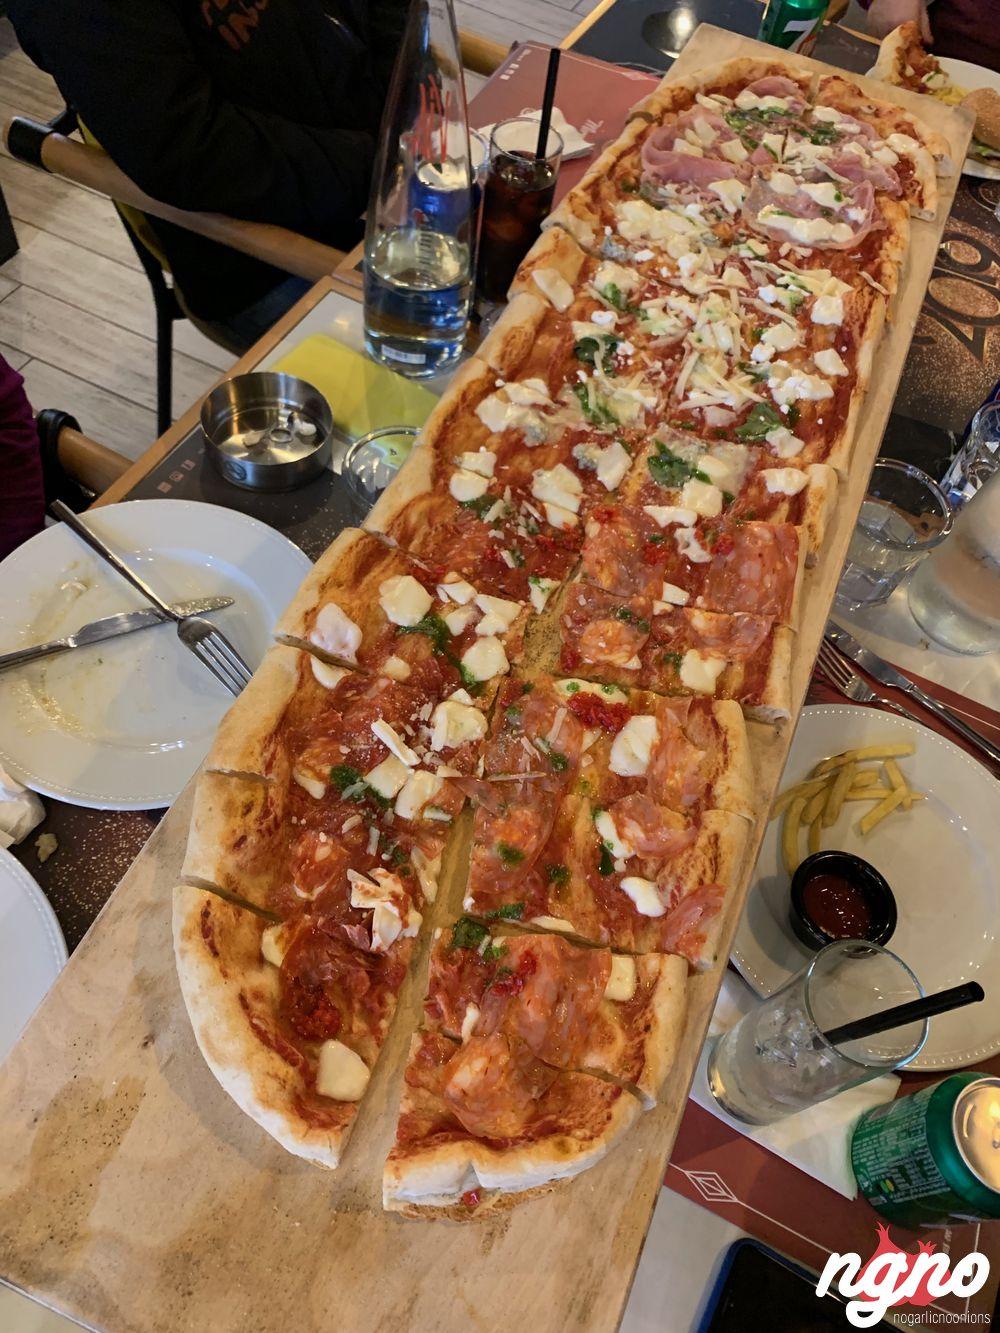 via-roma-pizza-nogarlicnoonions-212019-01-20-05-45-49